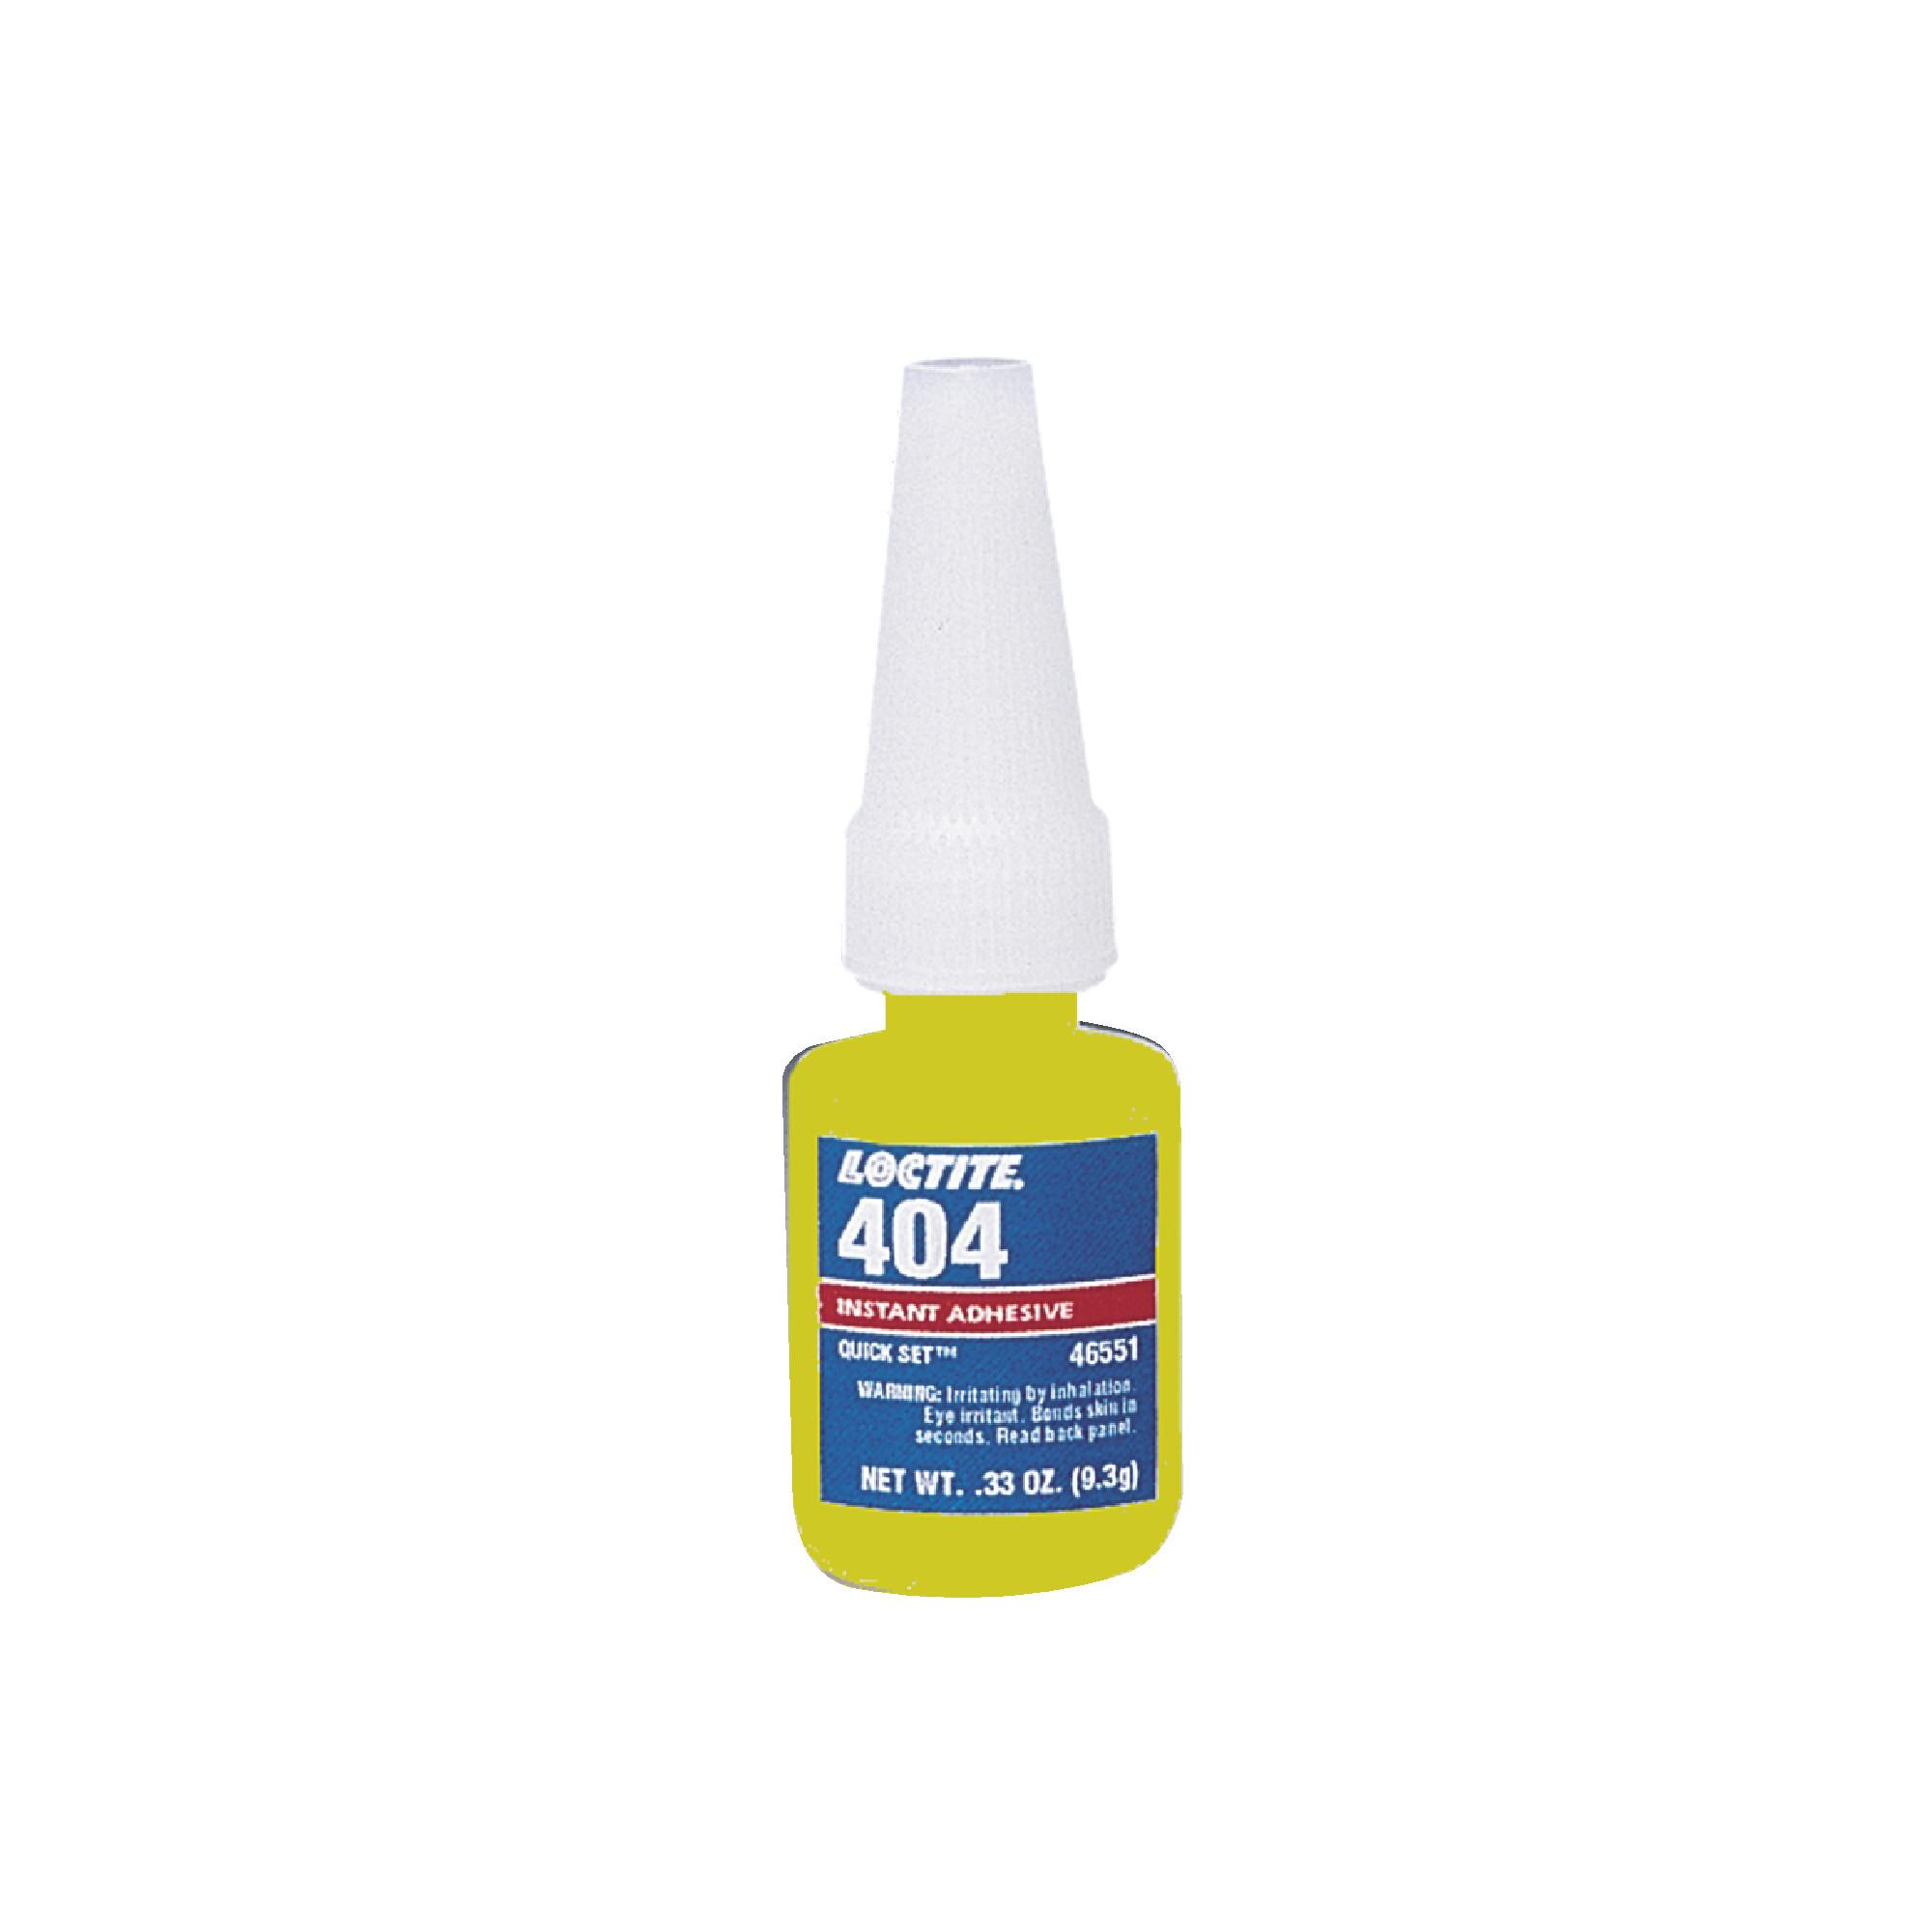 404™ Quick Set™ Instant Adhesive